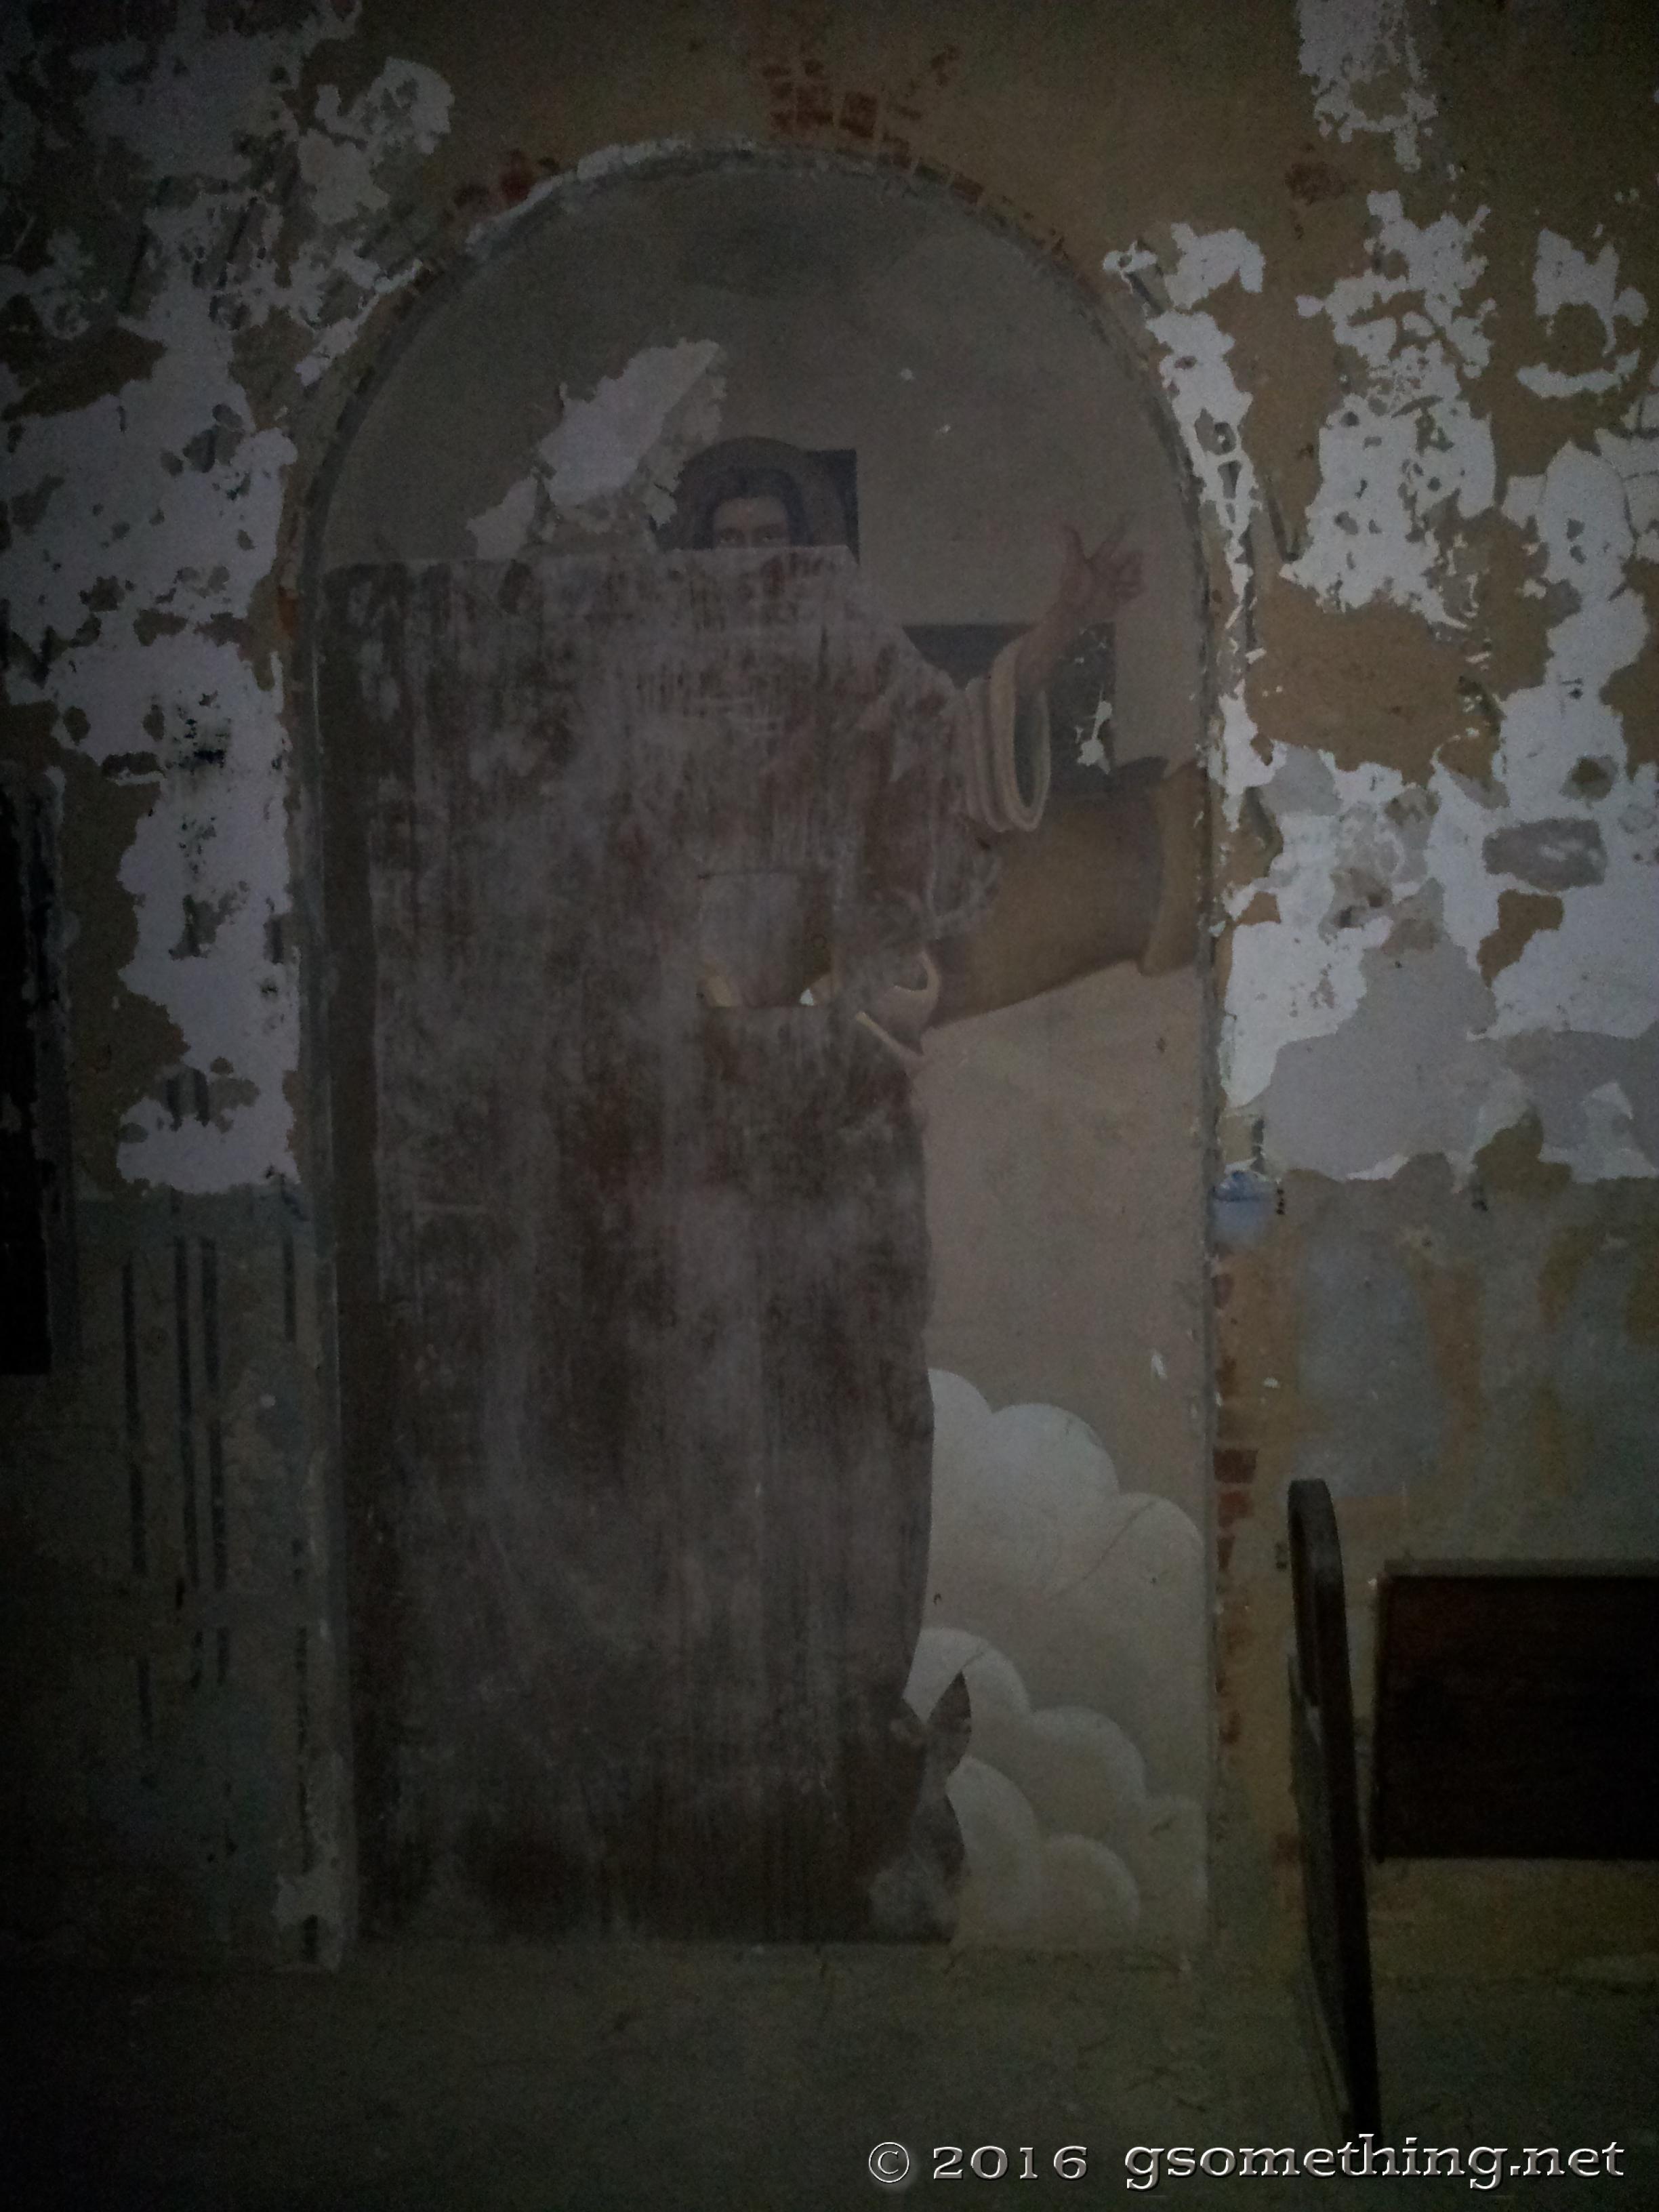 mansfield_reformatory_1st_trip_46.jpg